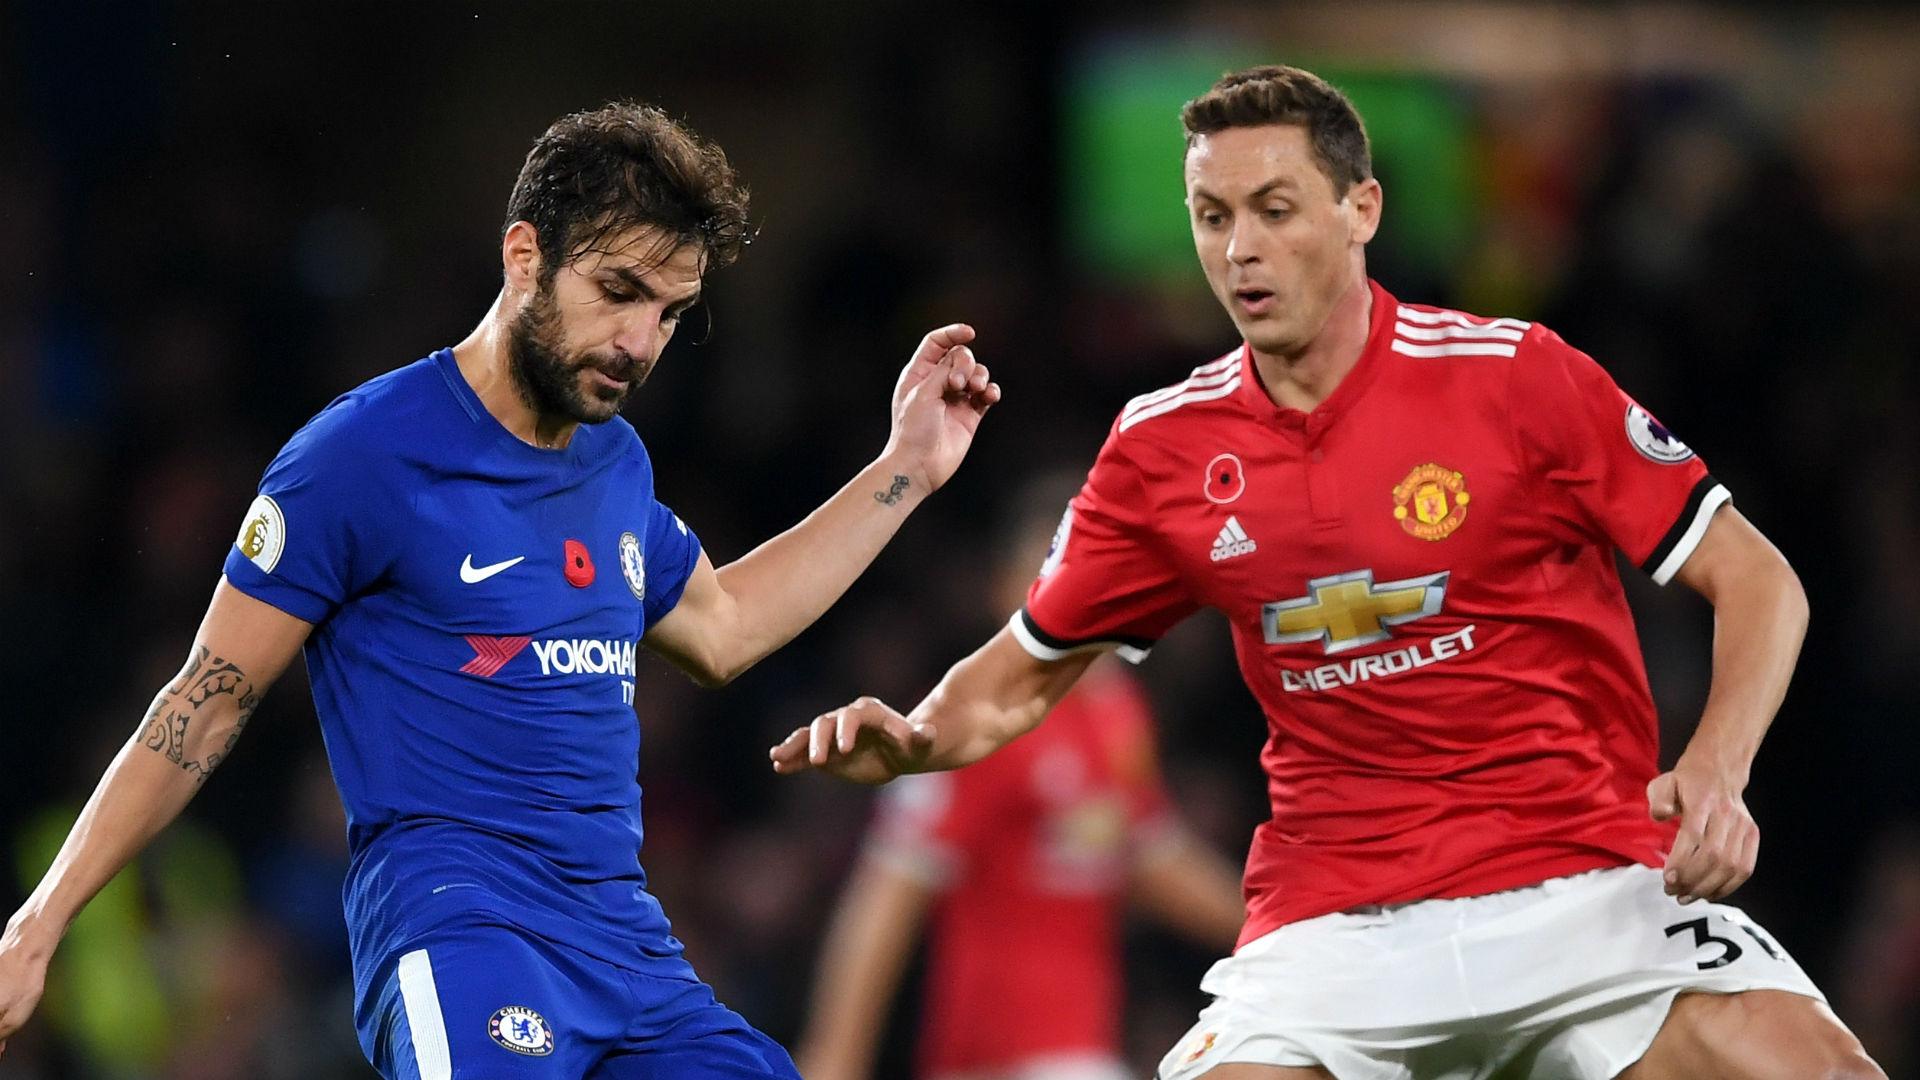 Cesc Fabregas Chelsea Nemanja Matic Manchester United